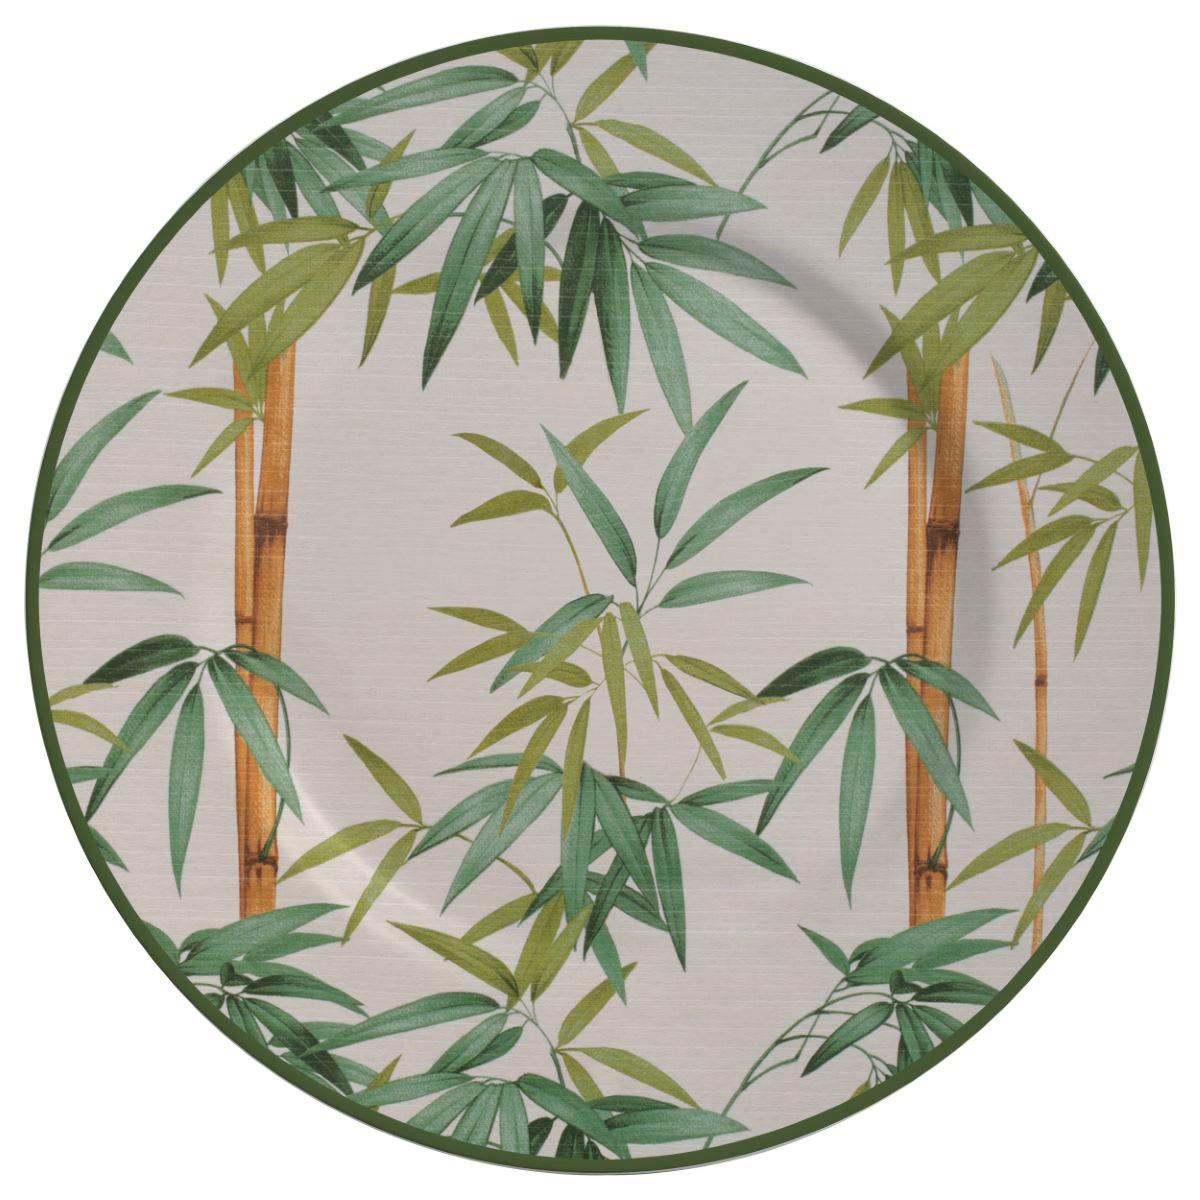 Prato Raso Bambu Cerâmica Alleanza - 6 Peças